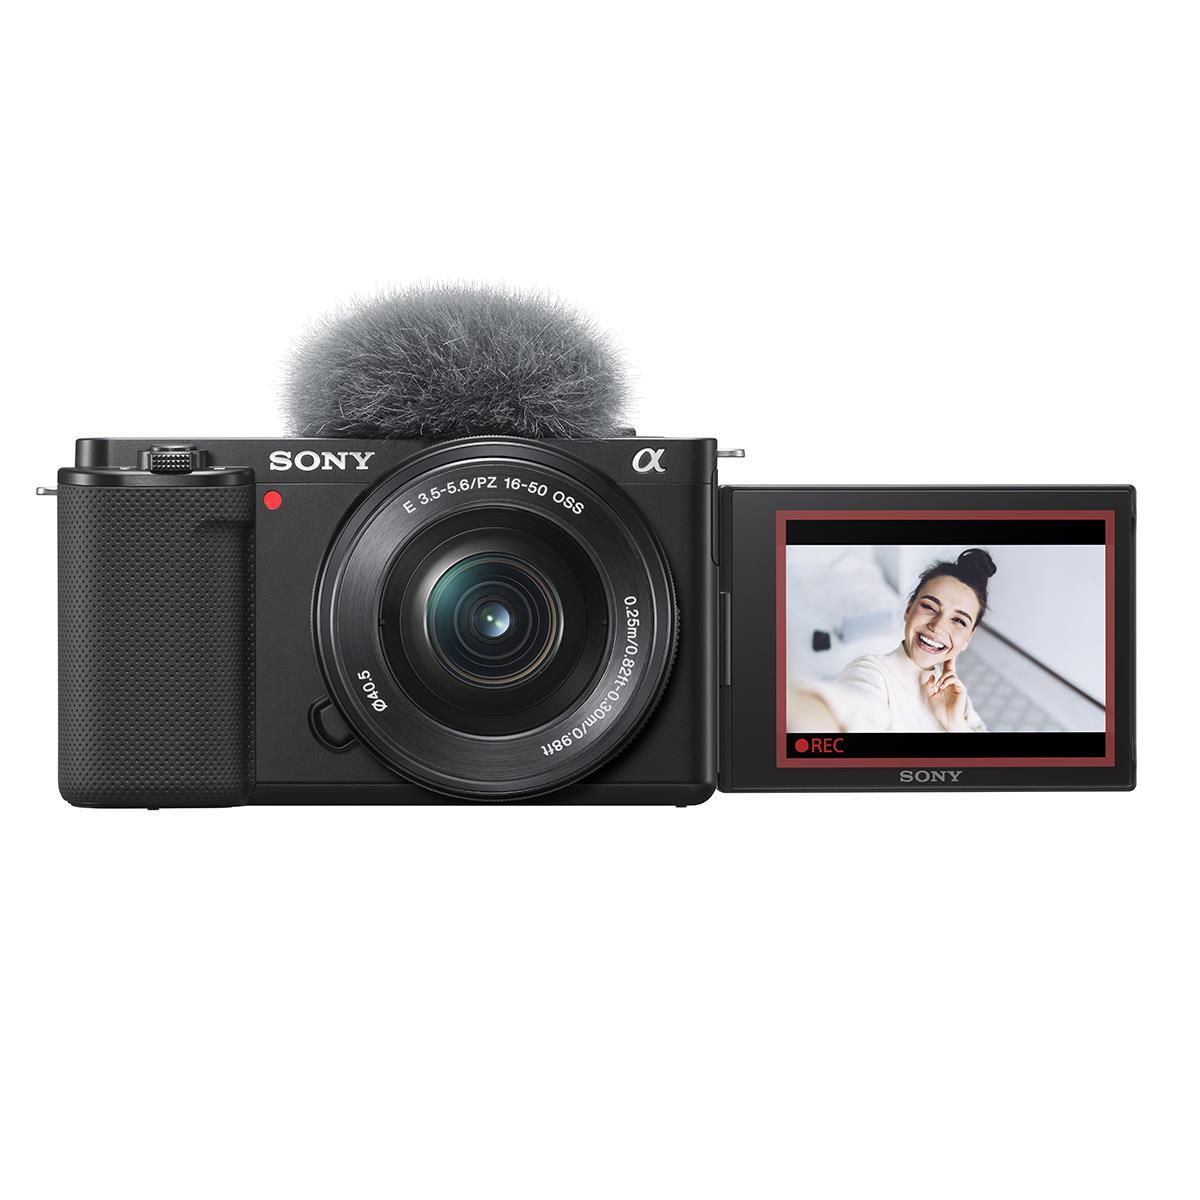 Sony Alpha ZV-E10 Camera with 16-50mm Lens Kit - Black